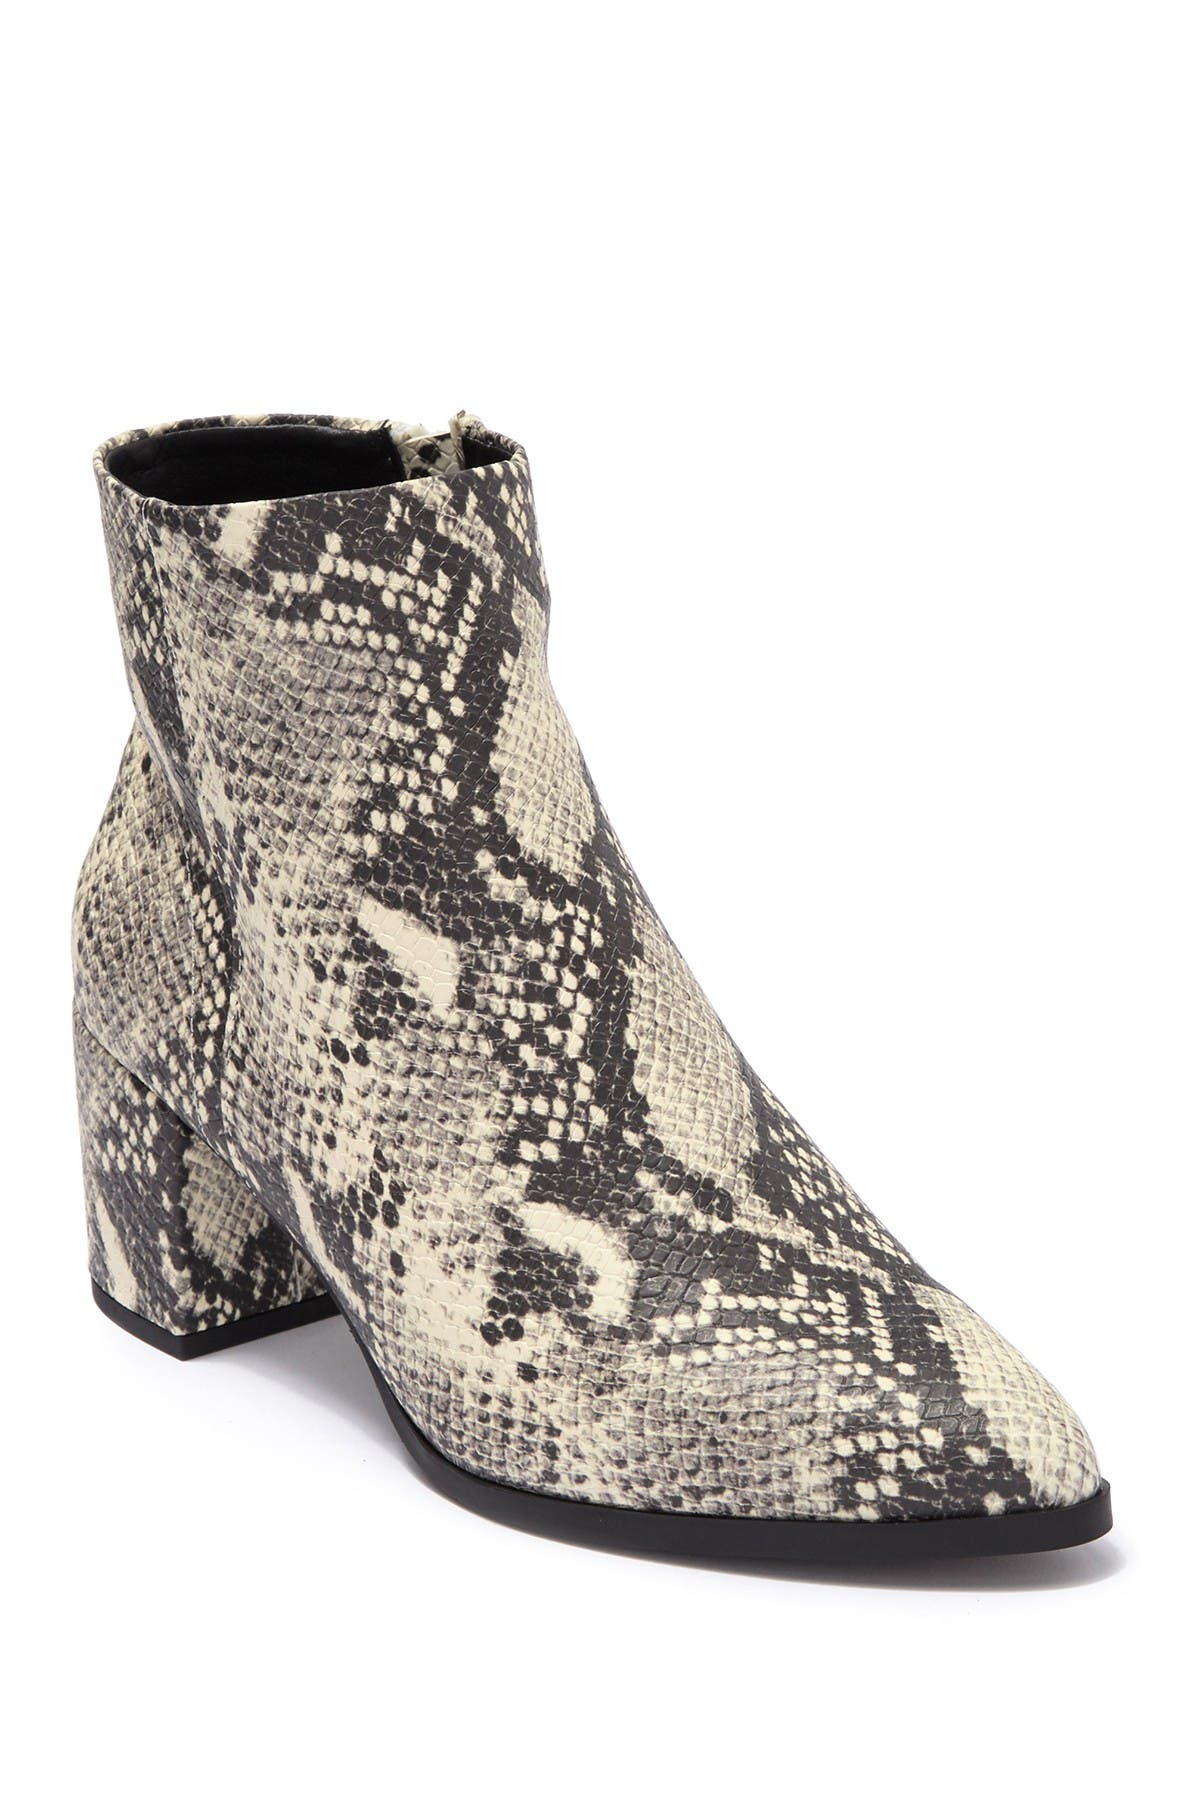 Leopard \u0026 Animal Print Shoes